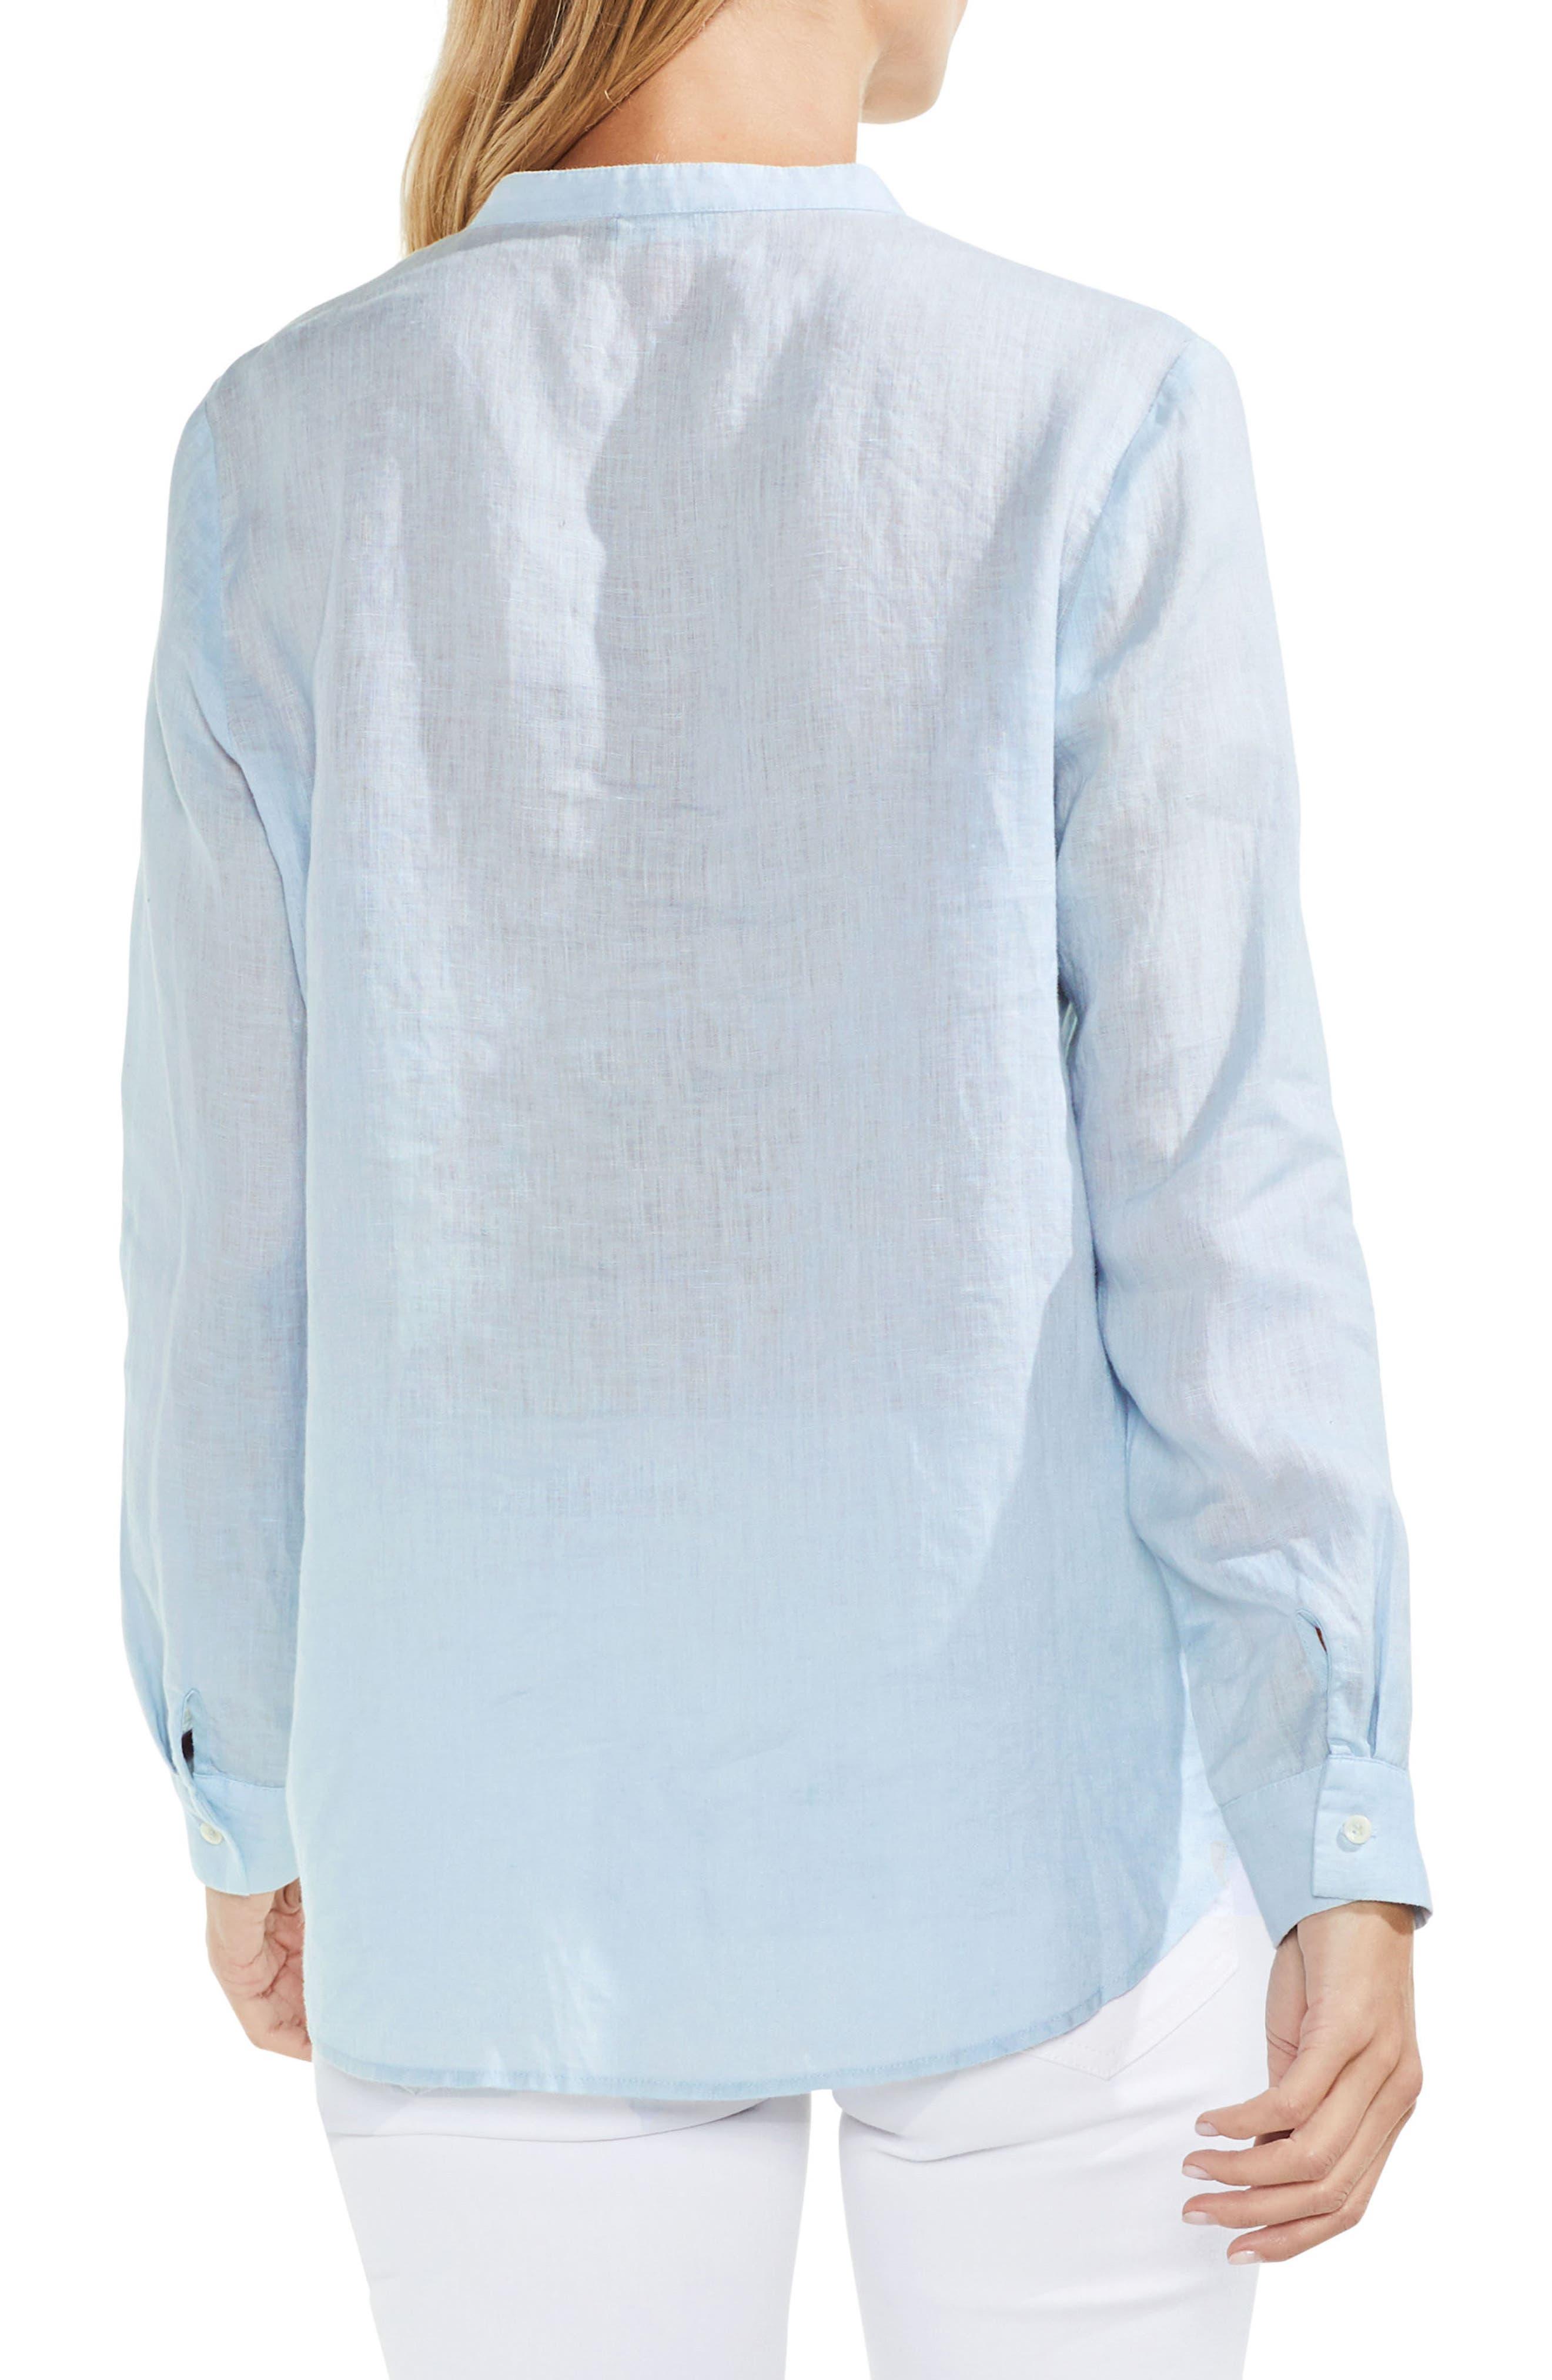 Pintuck Linen Shirt,                             Alternate thumbnail 2, color,                             Sea Salt